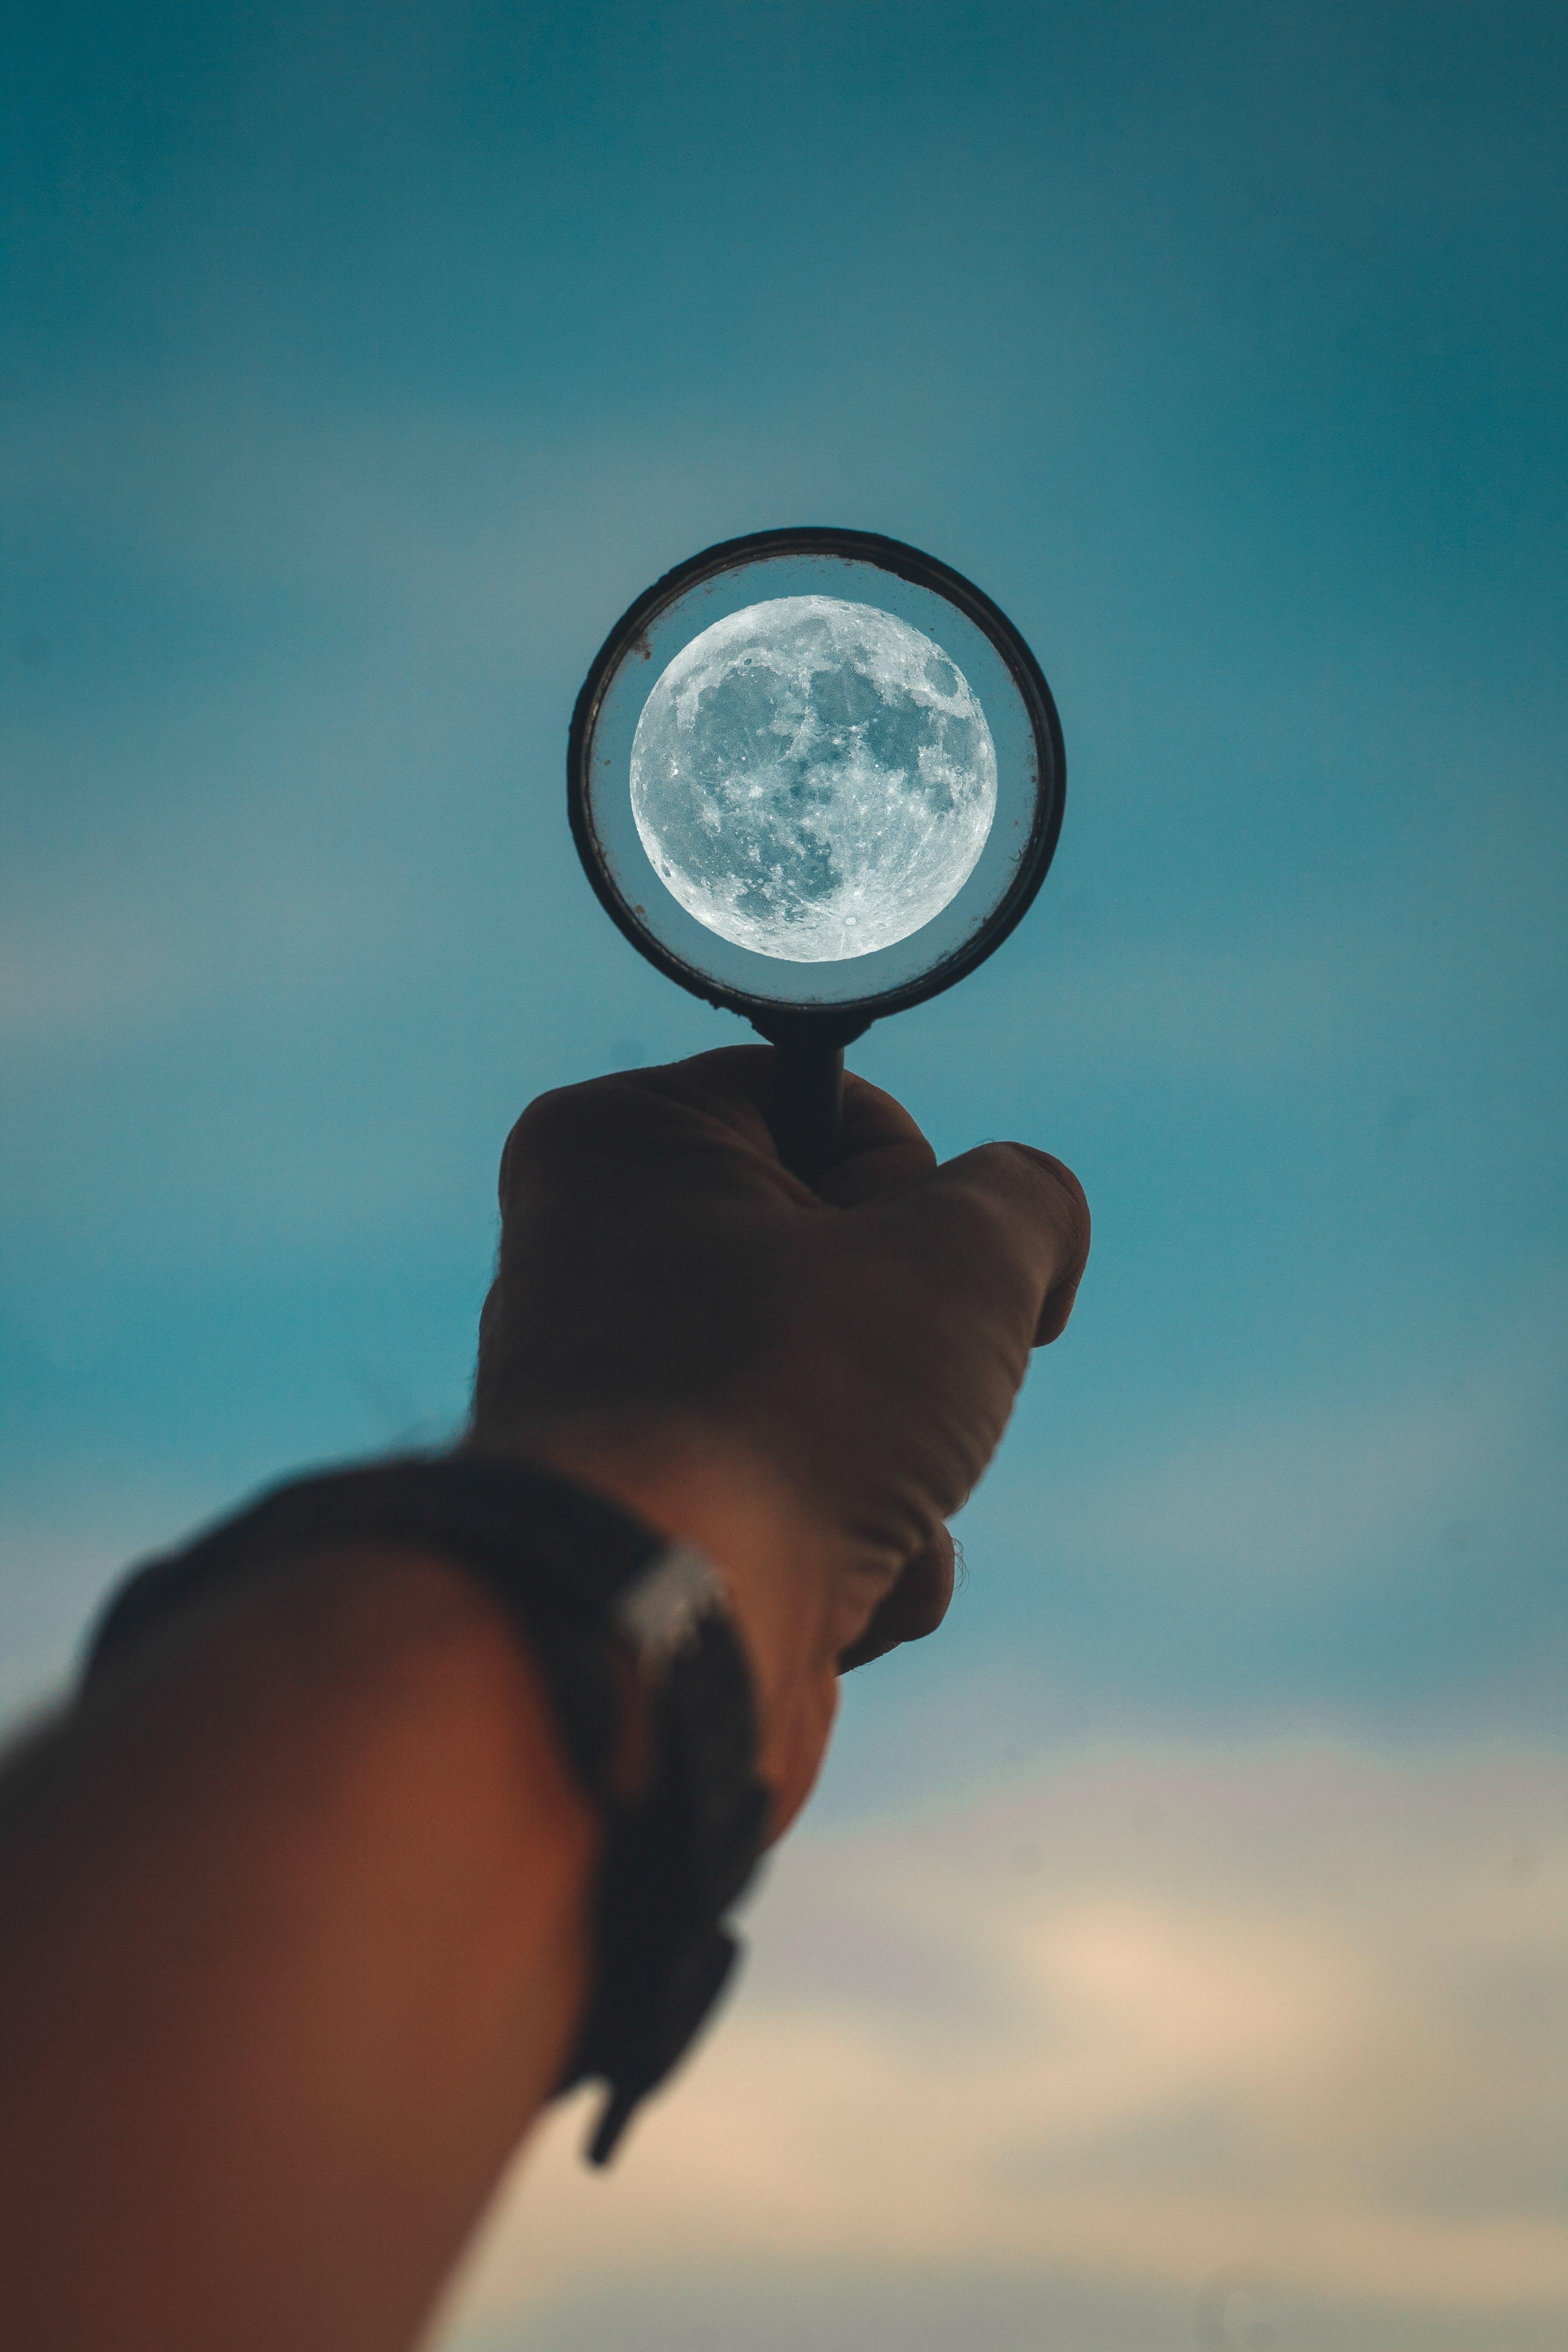 focus on the moon, moon